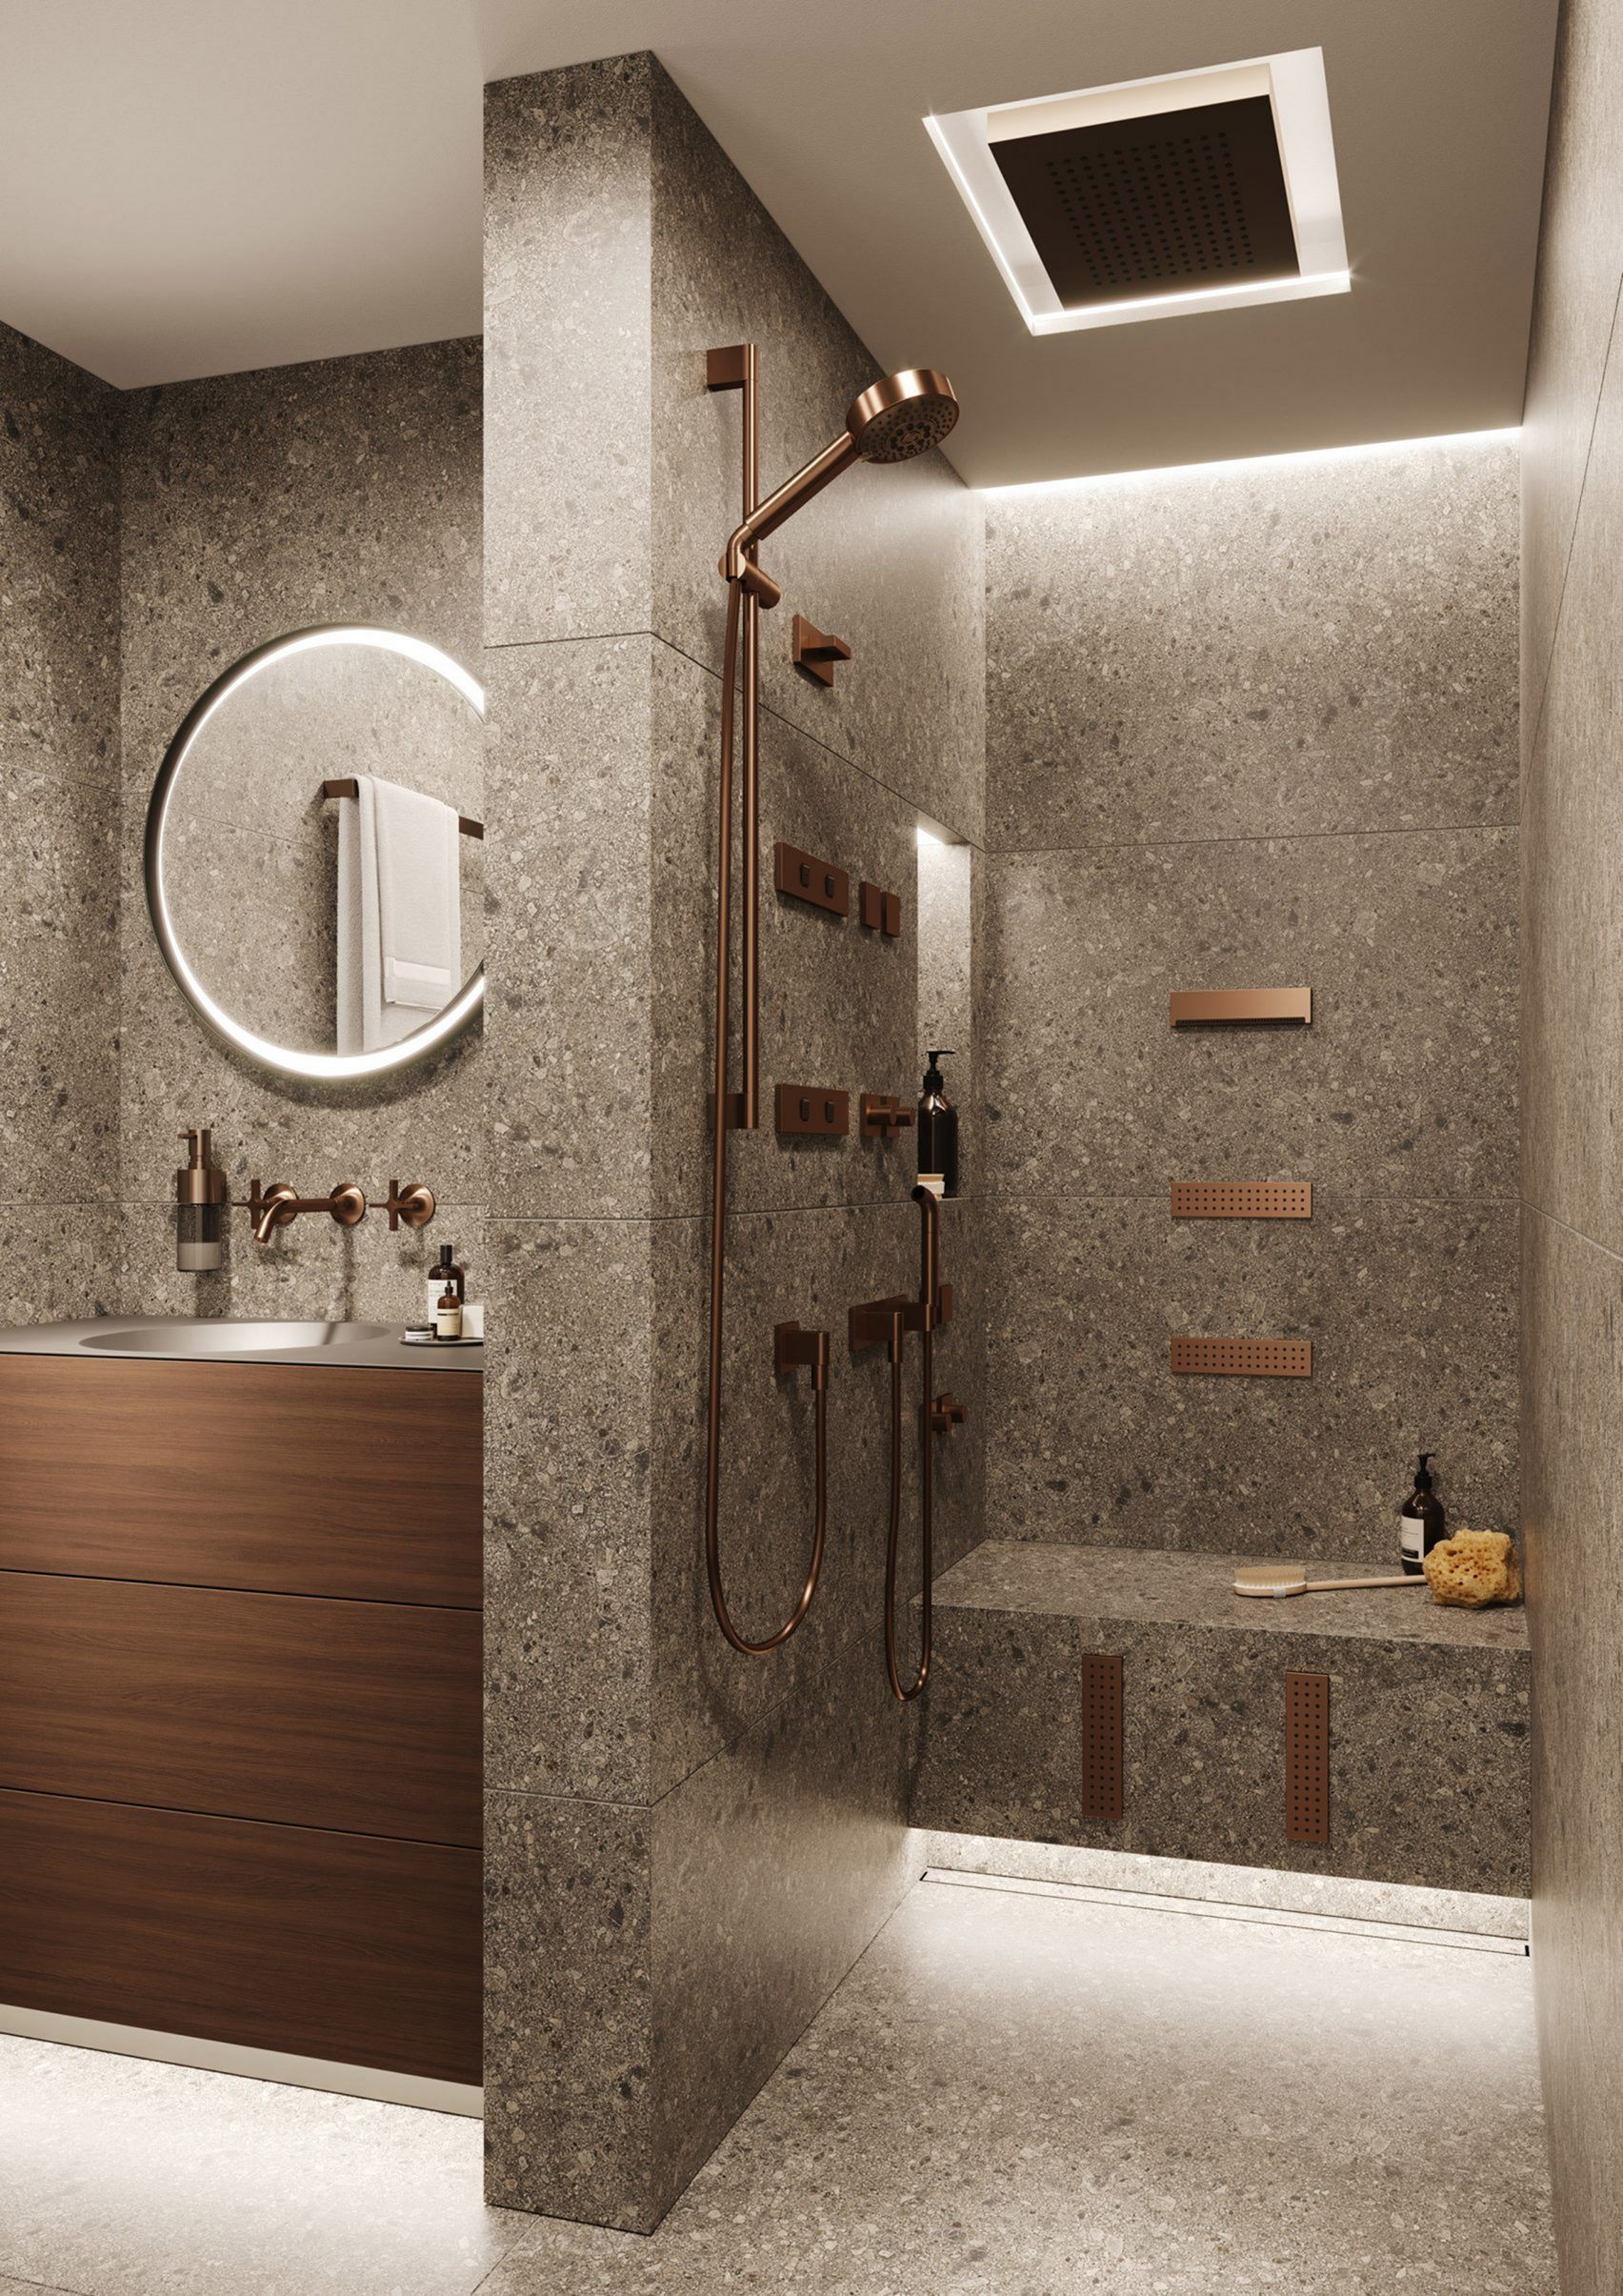 Small Bathroom Apartment Design Ideas 150 Washroom Design Bathroom Design Small Modern Bathroom Design